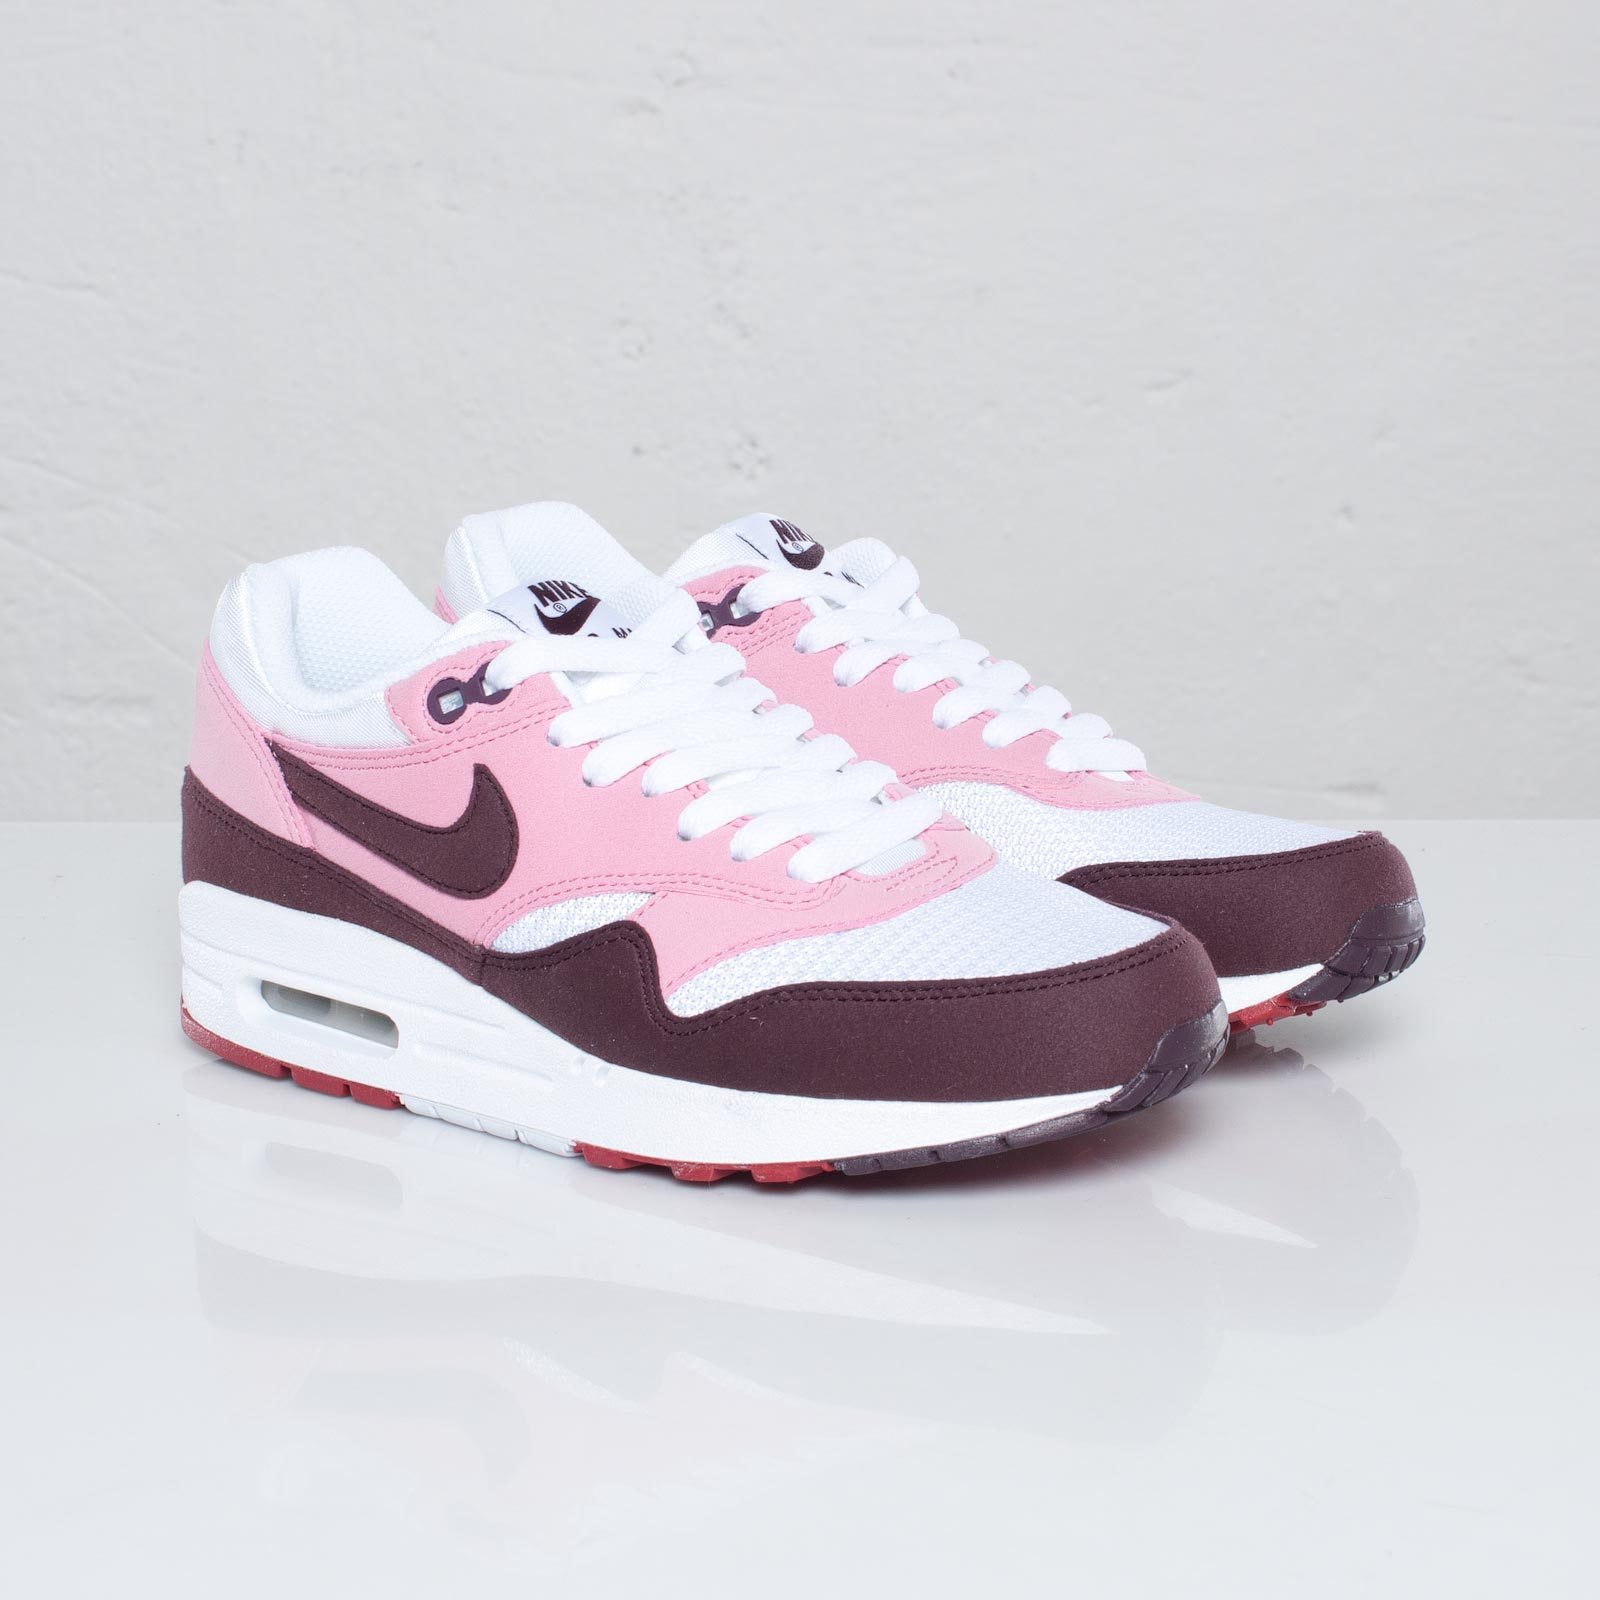 best cheap 3b0f0 b0dd9 Nike Wmns Air Max 1